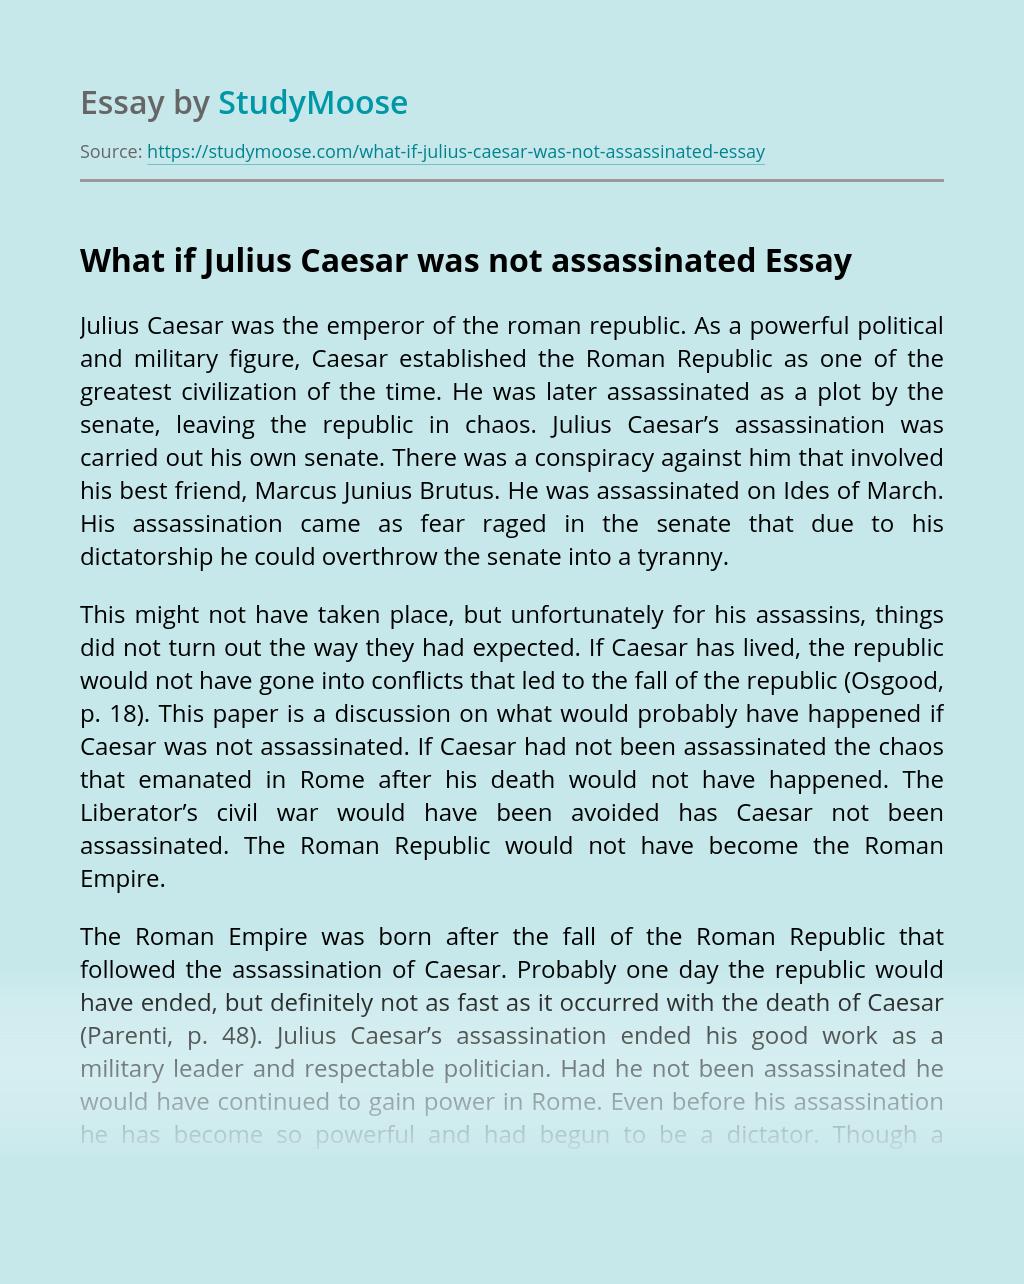 What if Julius Caesar was not assassinated